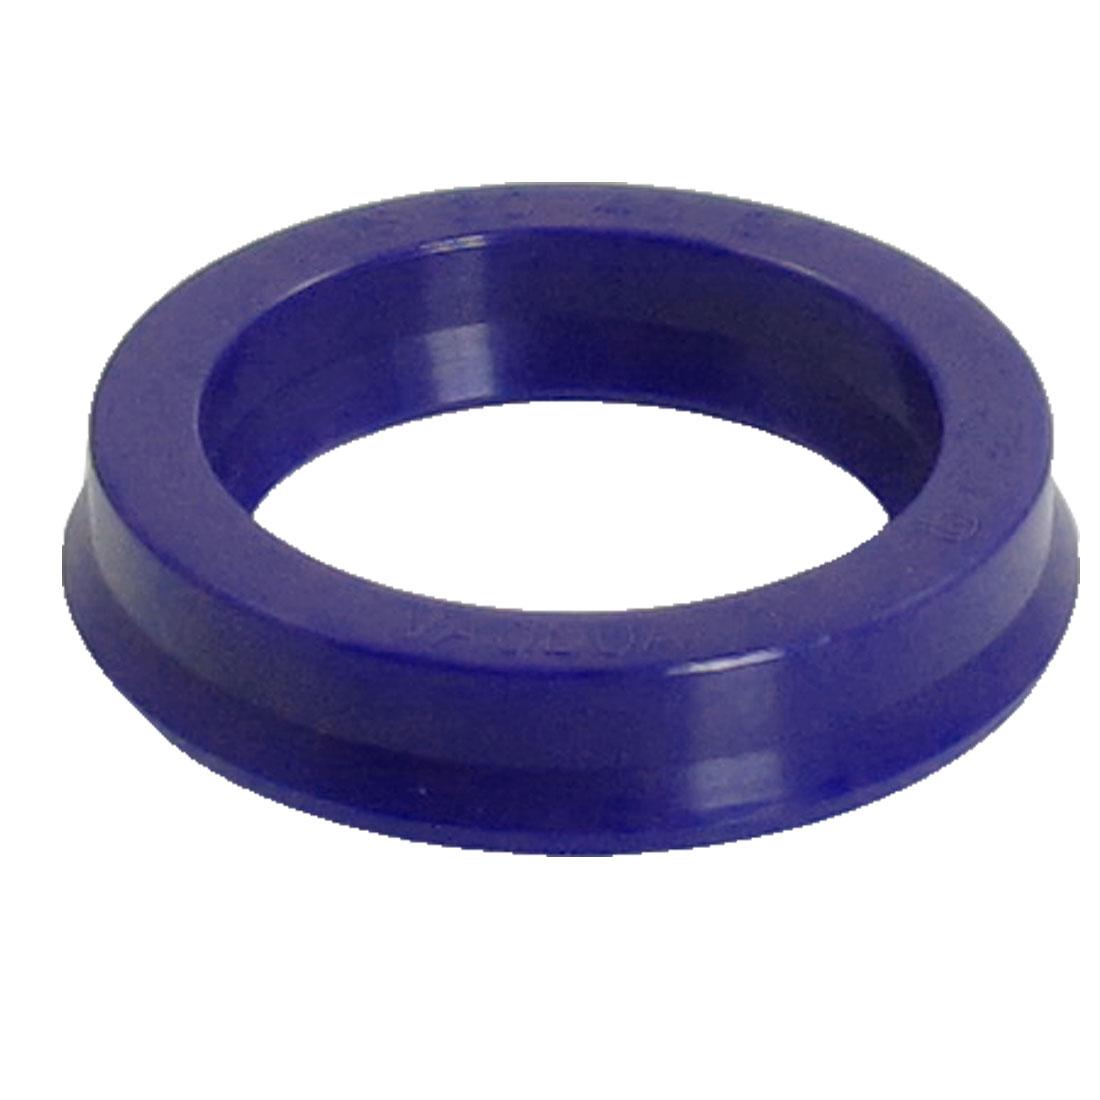 Blue PU 30mm x 40mm x 8mm Double Lip Sealing Cushion Dust Seal Ring